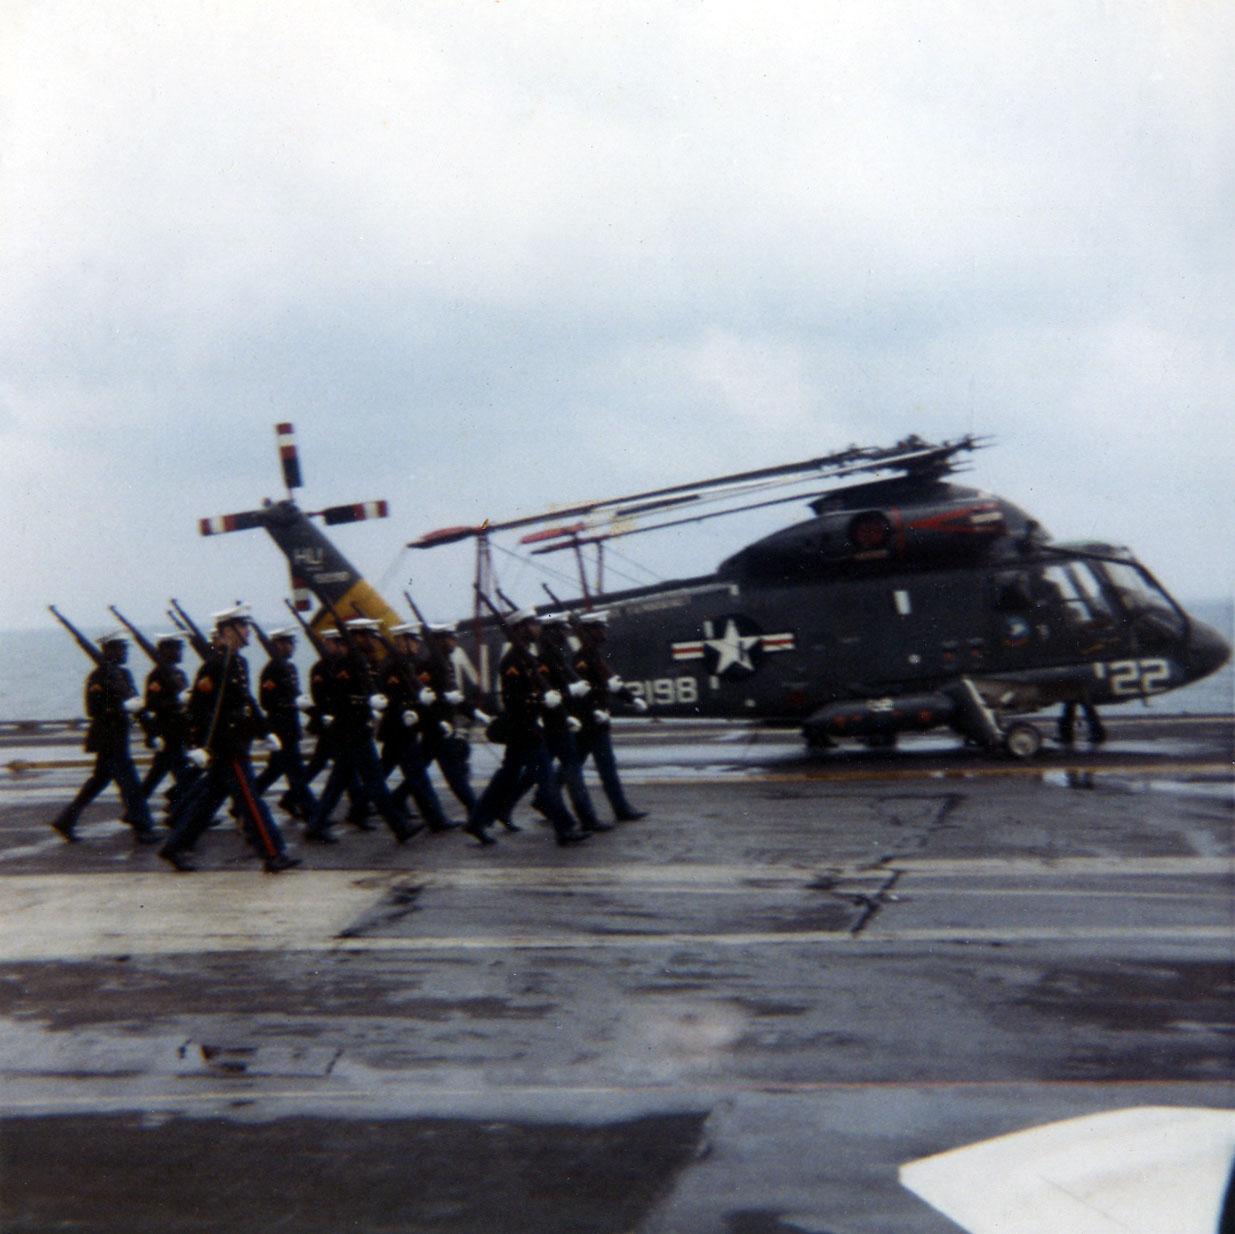 04-marine-detatchment-in-naples01-w